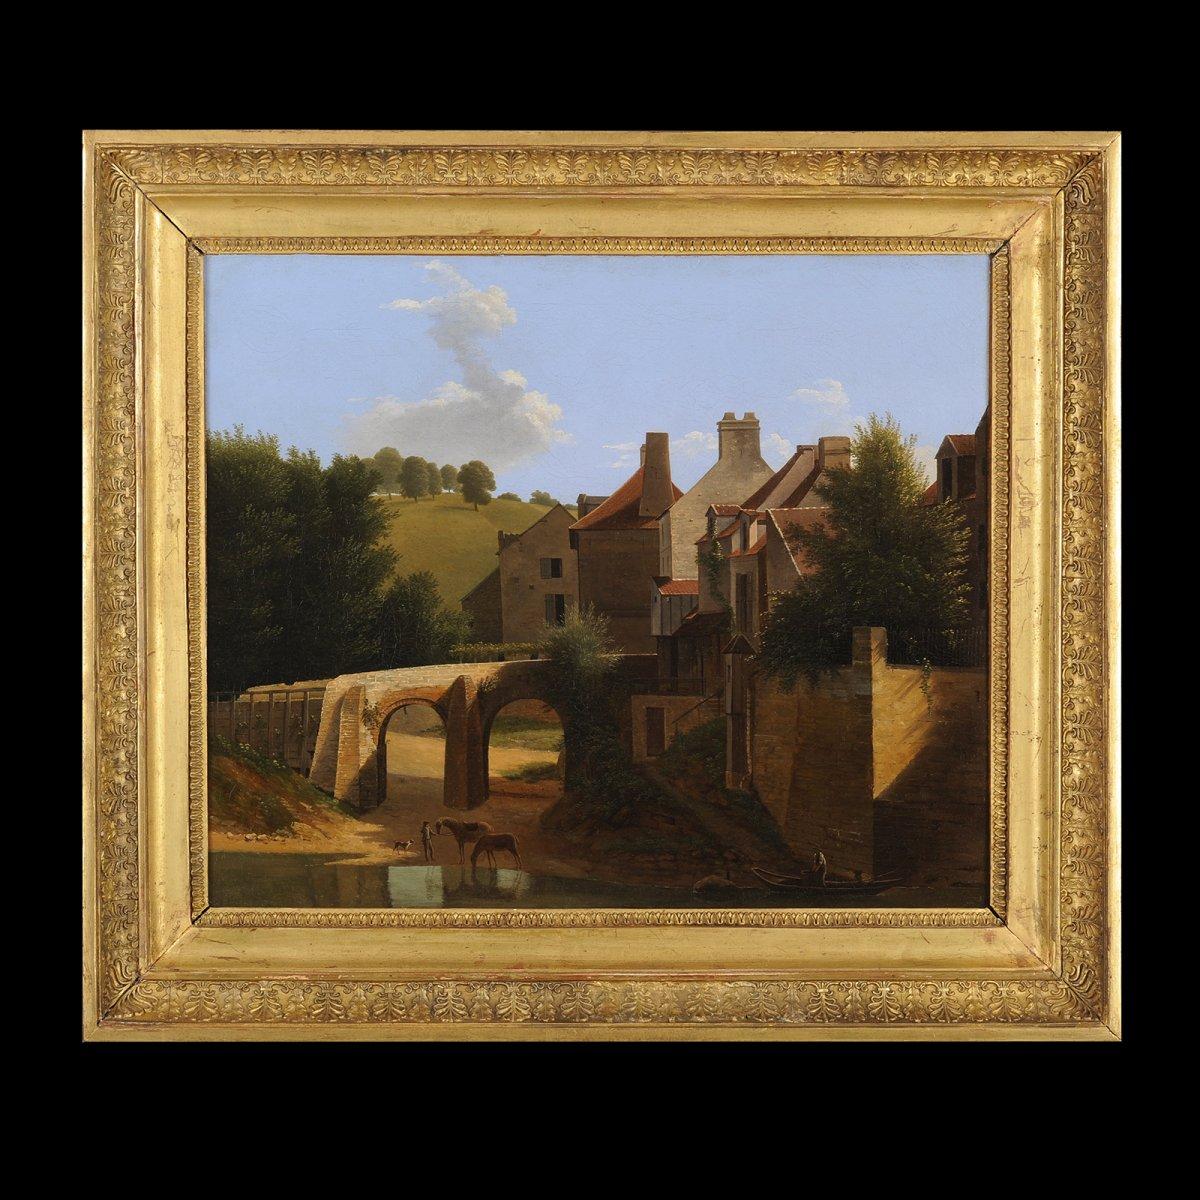 Jean-Victor Bertin (1767-1842) et atelier - Paysage d'Ile de France